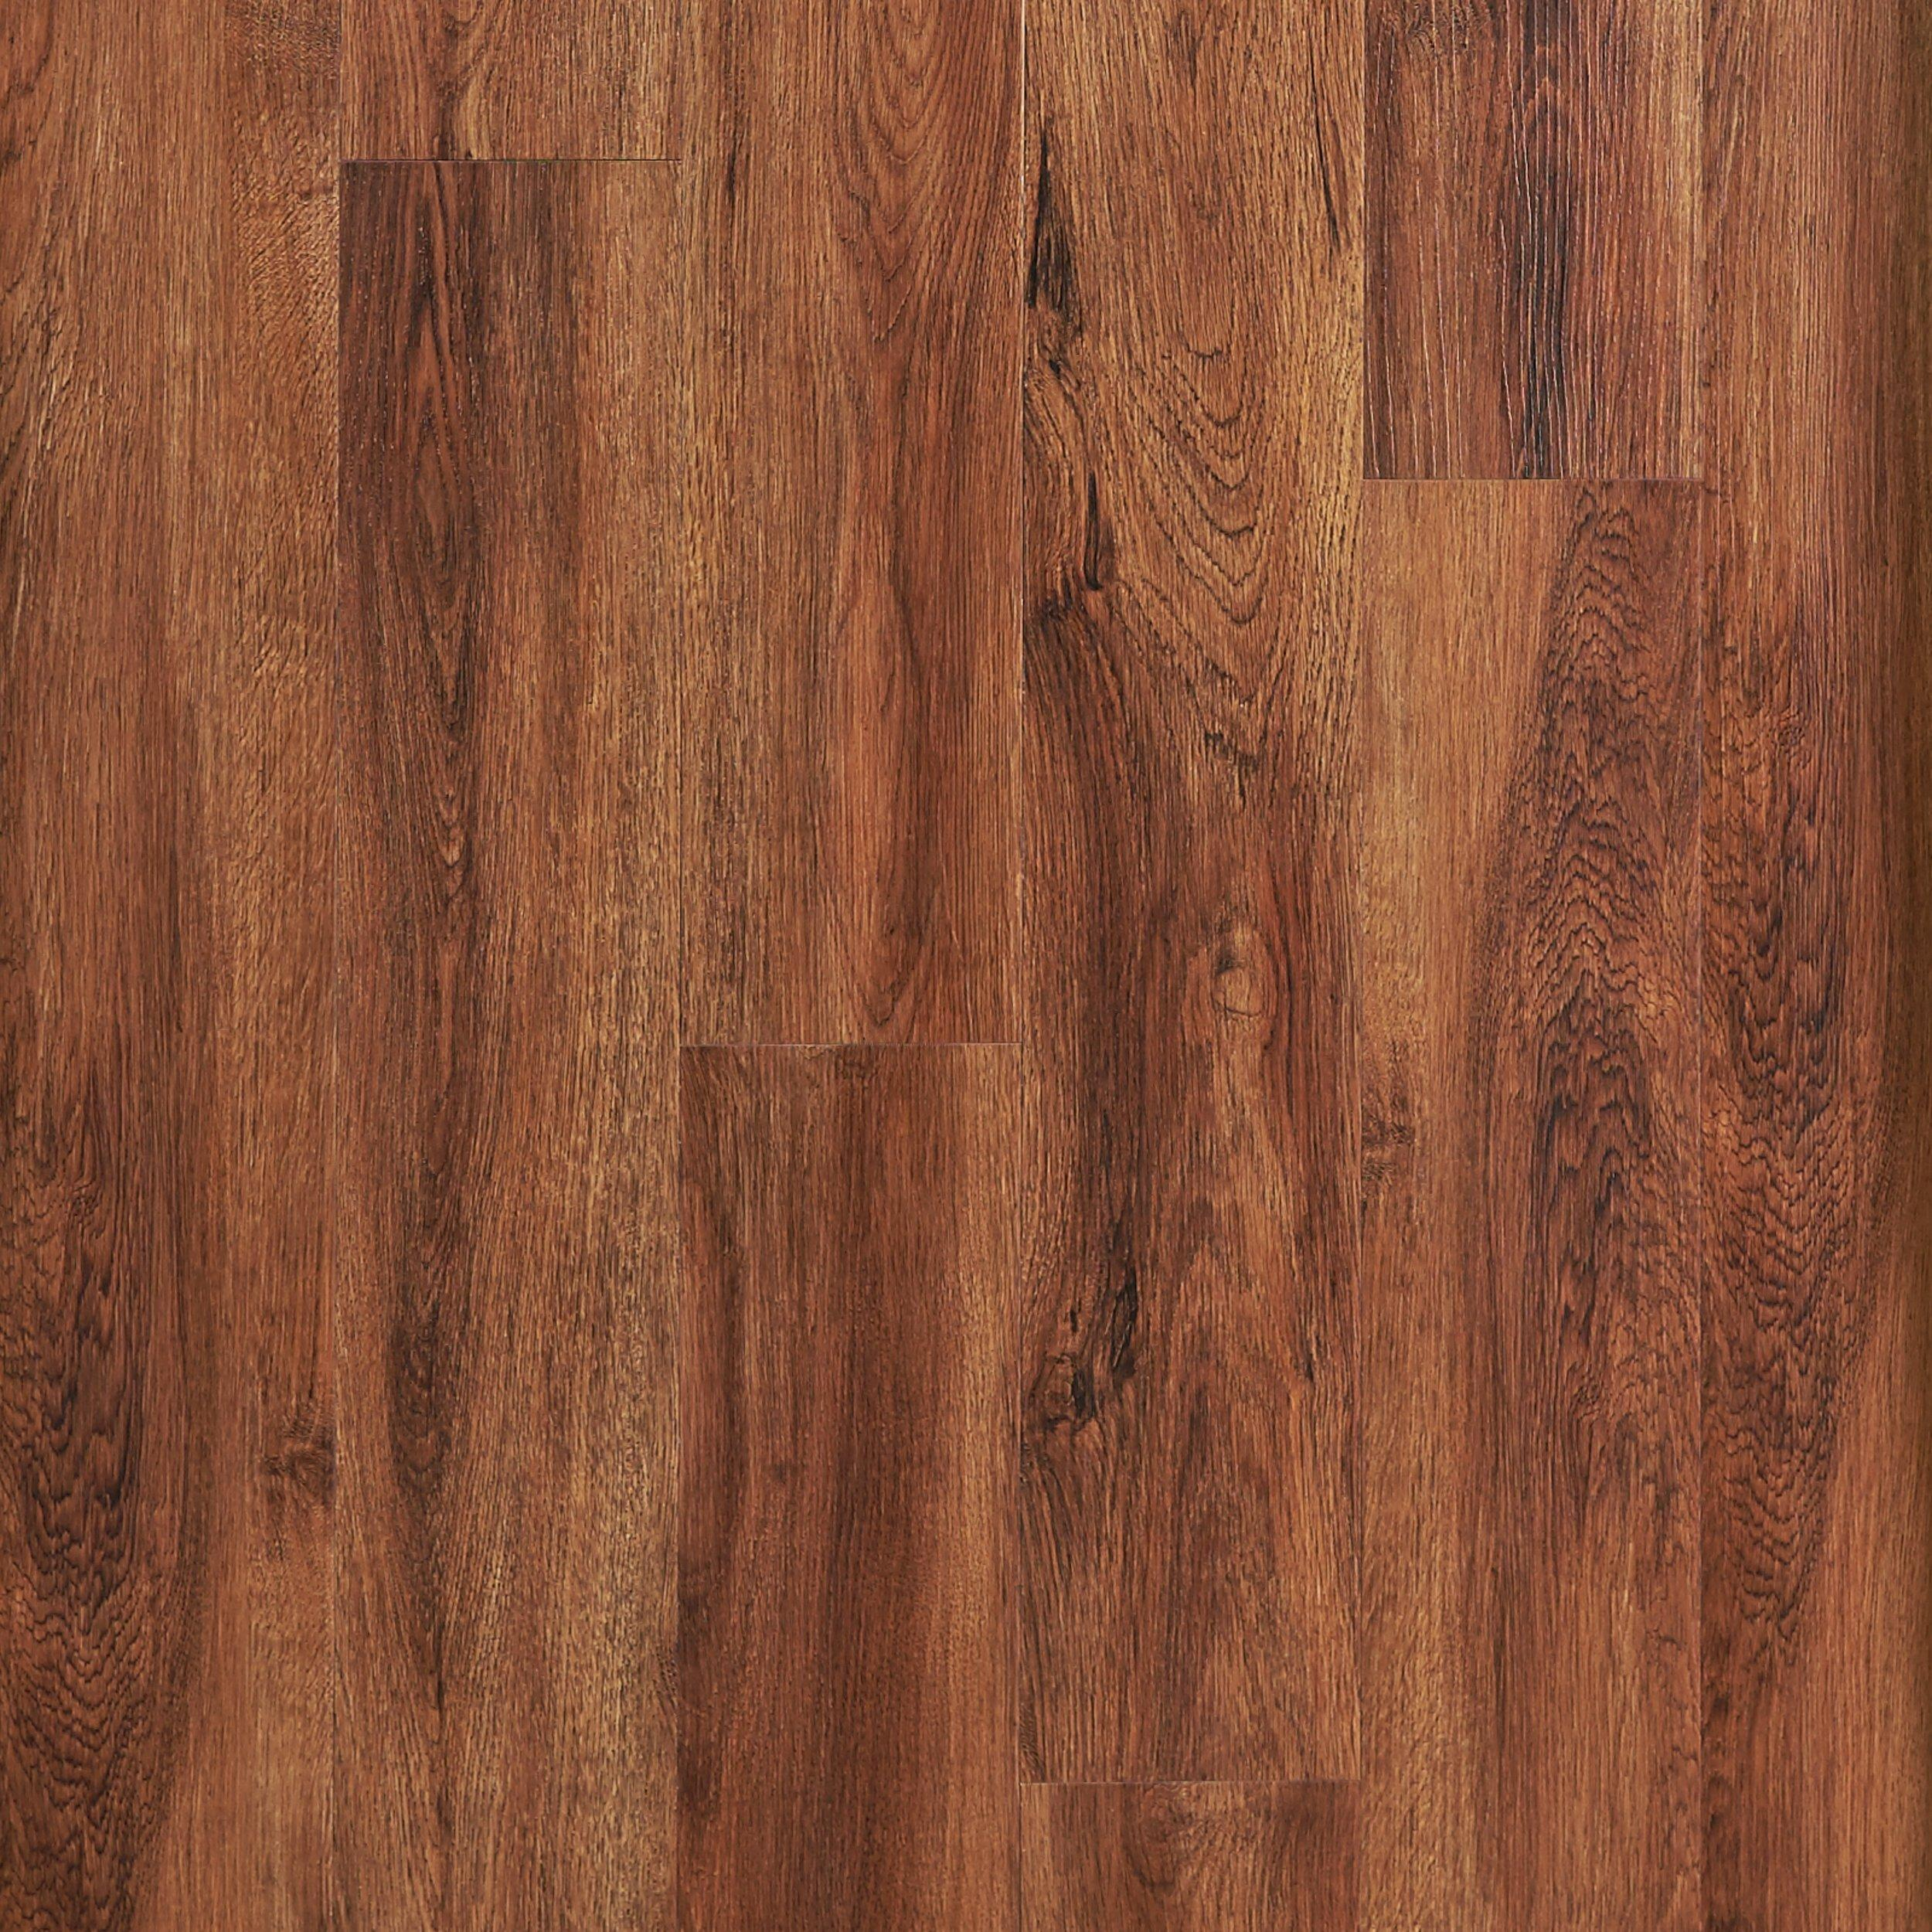 Marvelous NuCore Gunstock Oak Plank With Cork Back